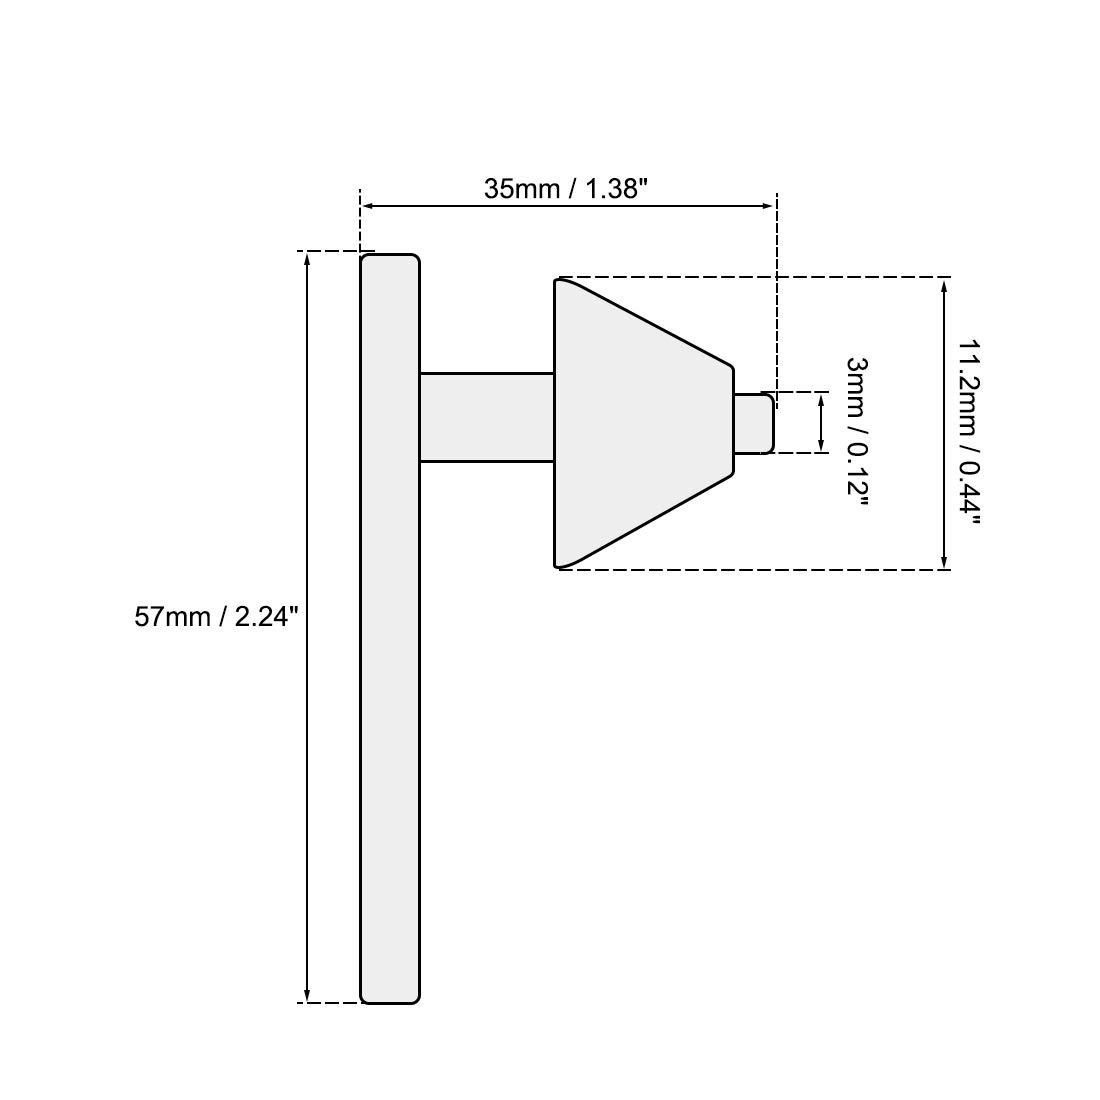 uxcell Chuck Key 8mm Pilot 11 Teeth for 3-16mm Drill Chuck Black